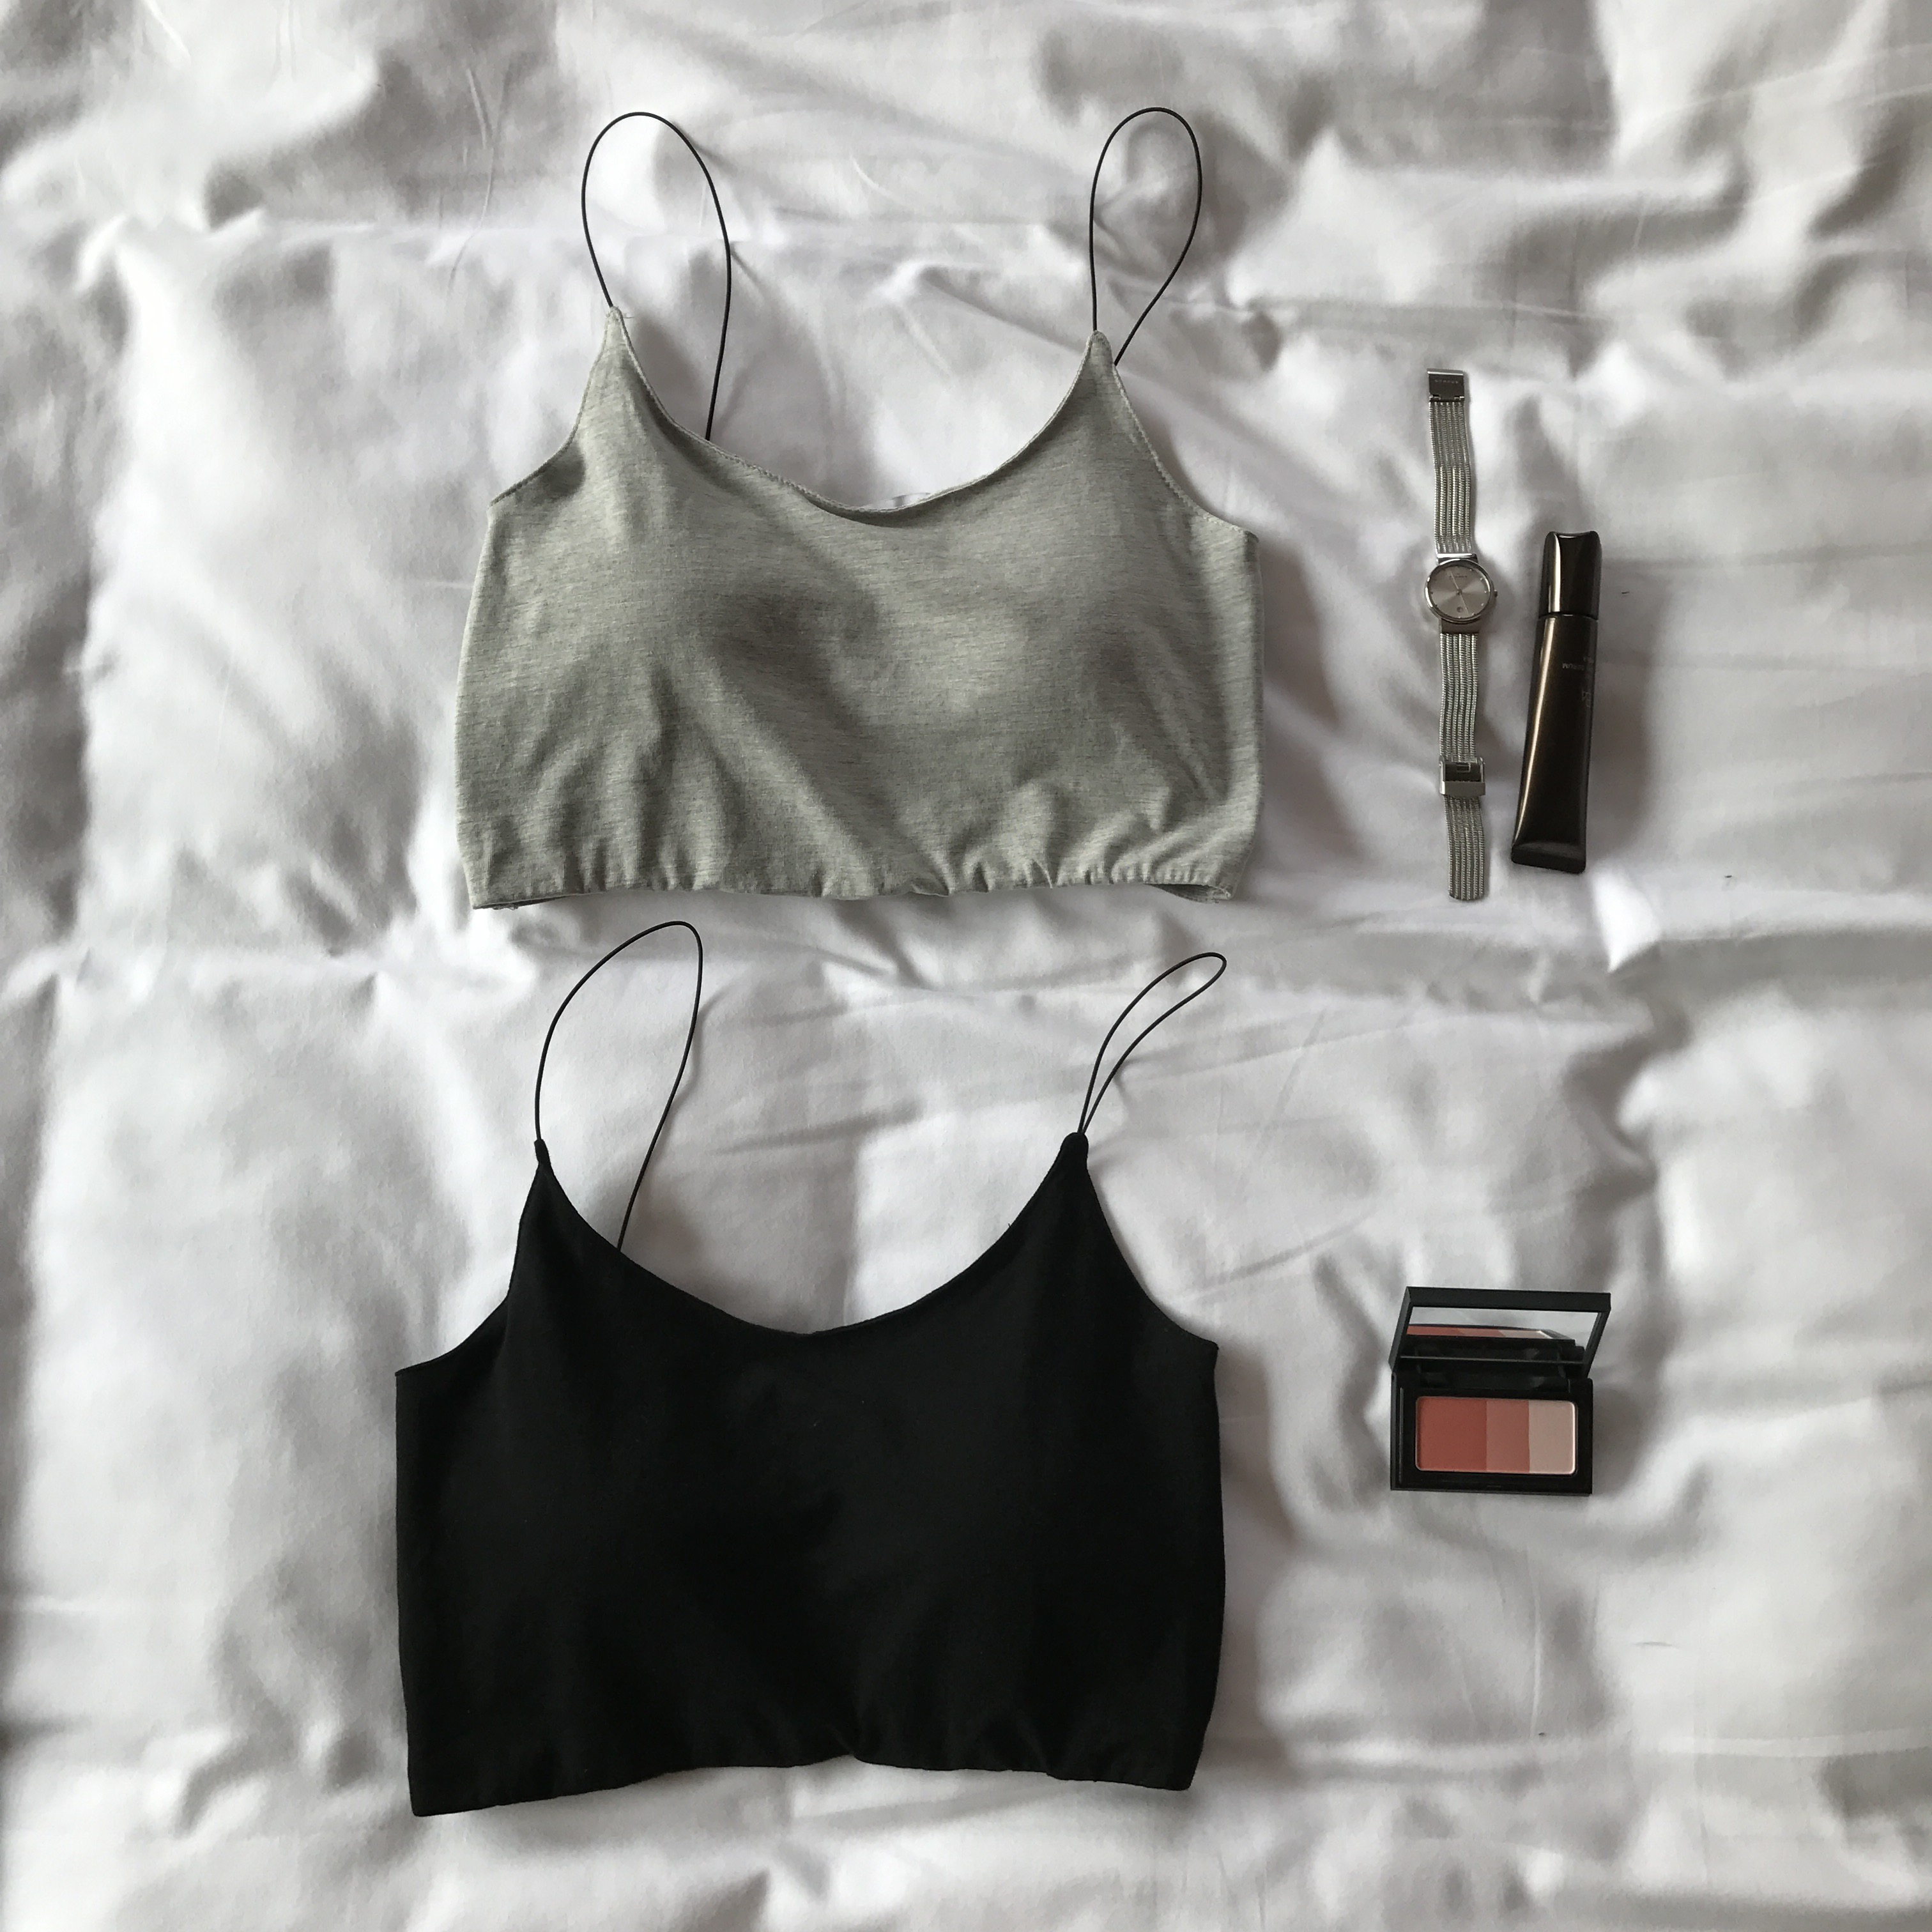 nini 春夏季带胸垫防走光简约基础内搭打底小裹胸背心吊带女